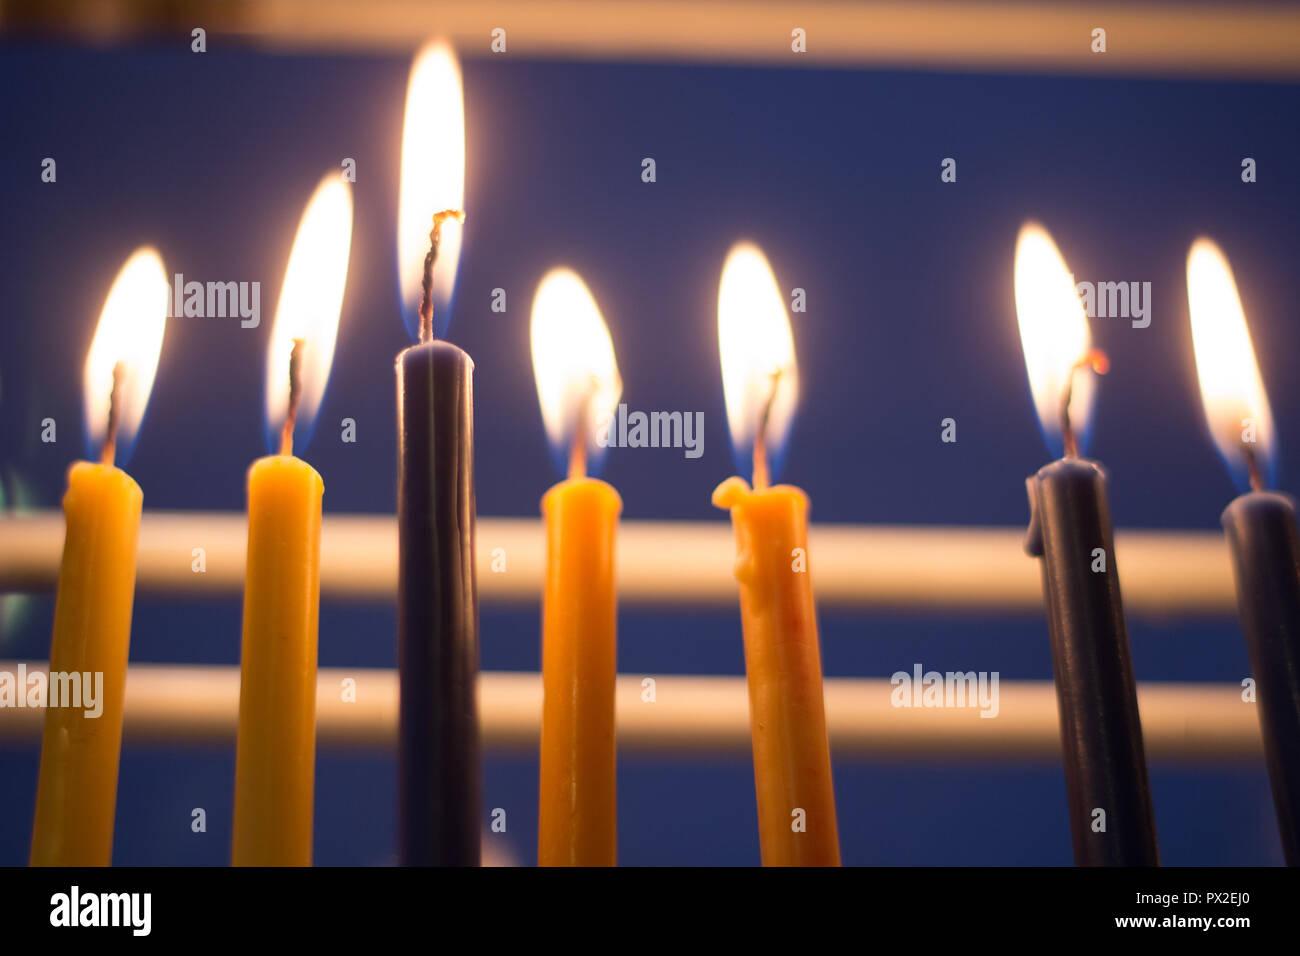 Candle Menora lit in window on Hanuka Holiday - Stock Image